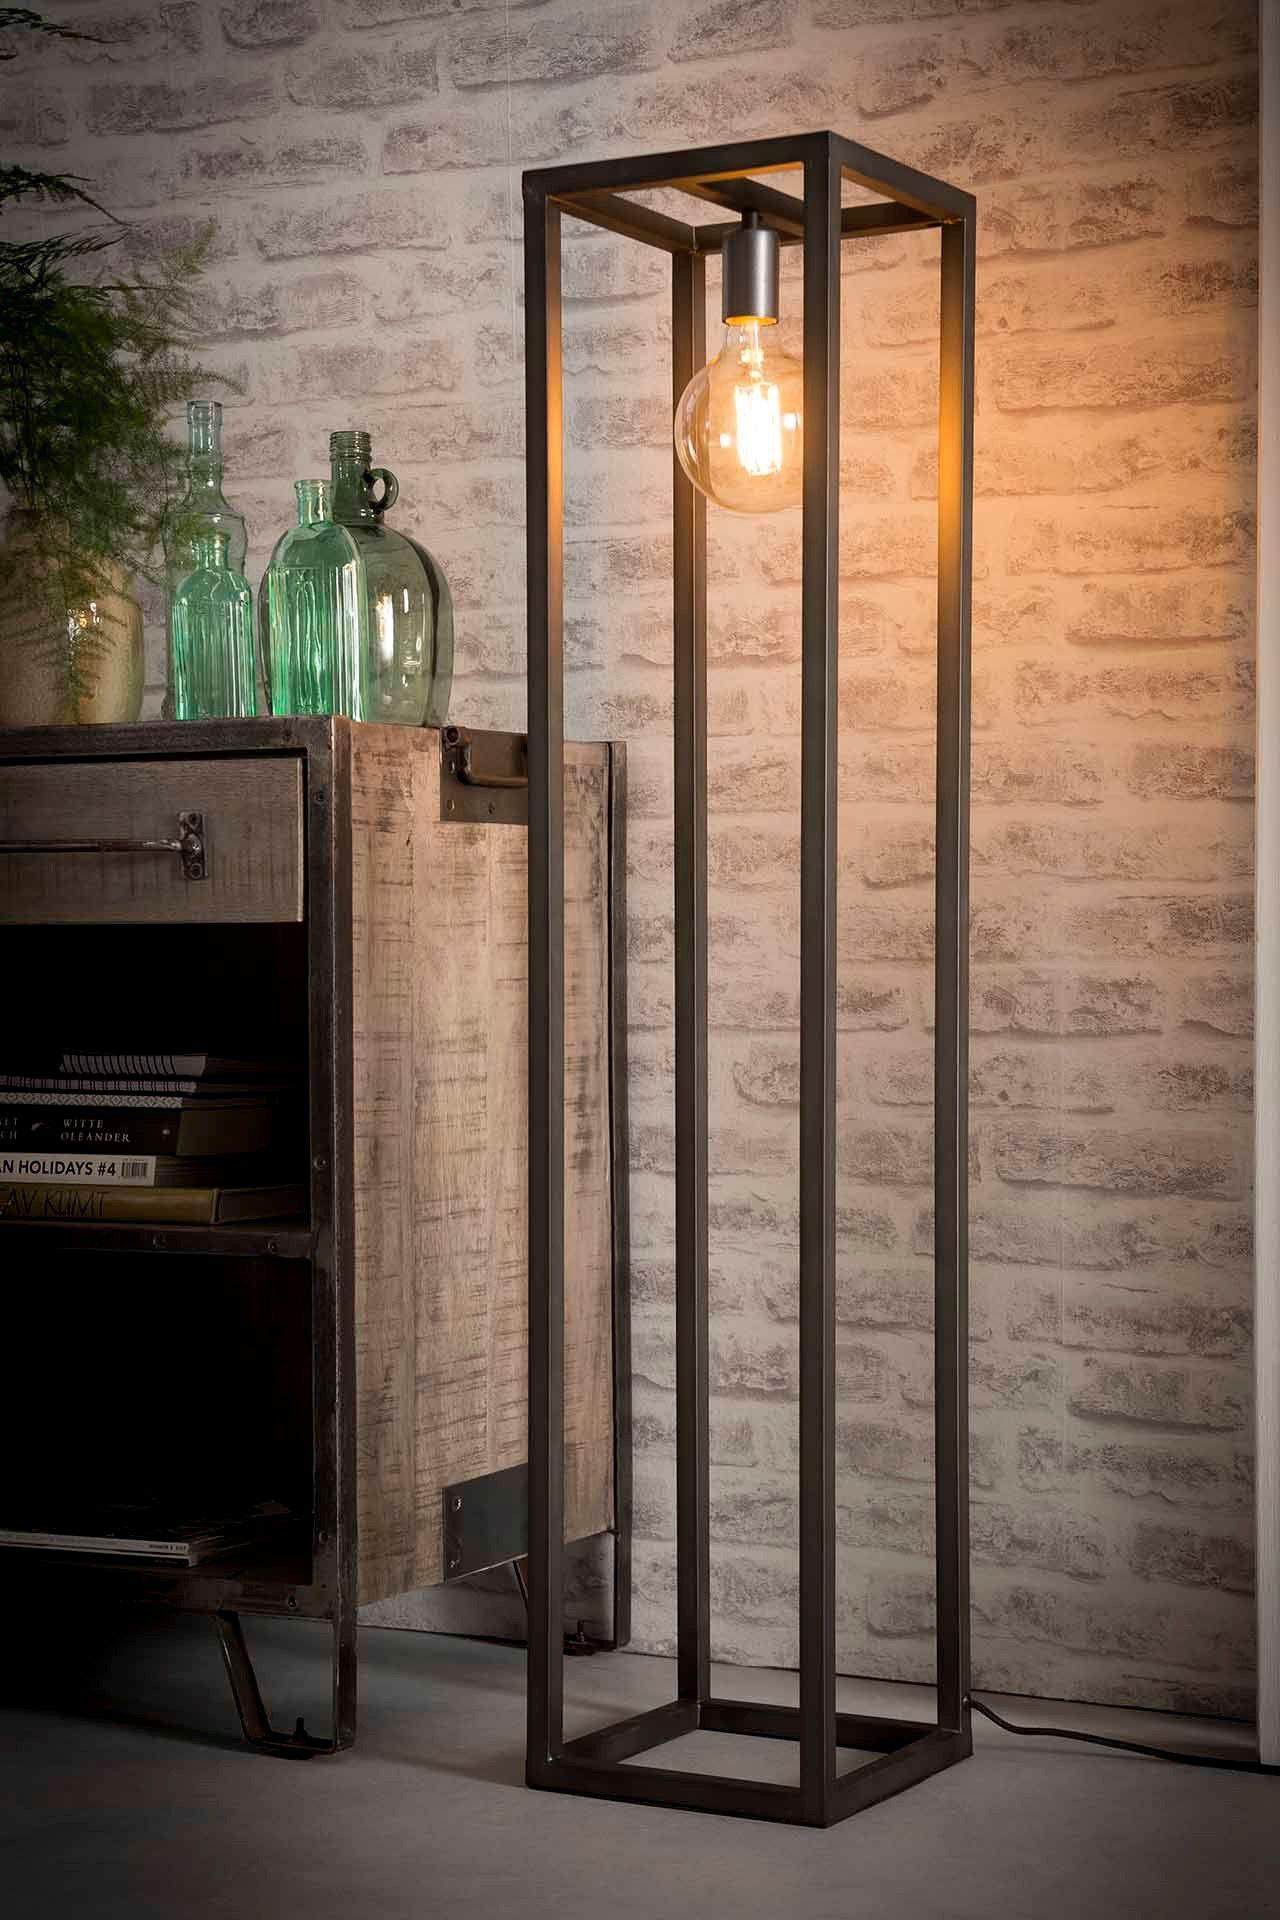 Extravagante Stehlampe In 2020 Industrie Strahler Stehlampe Lampe